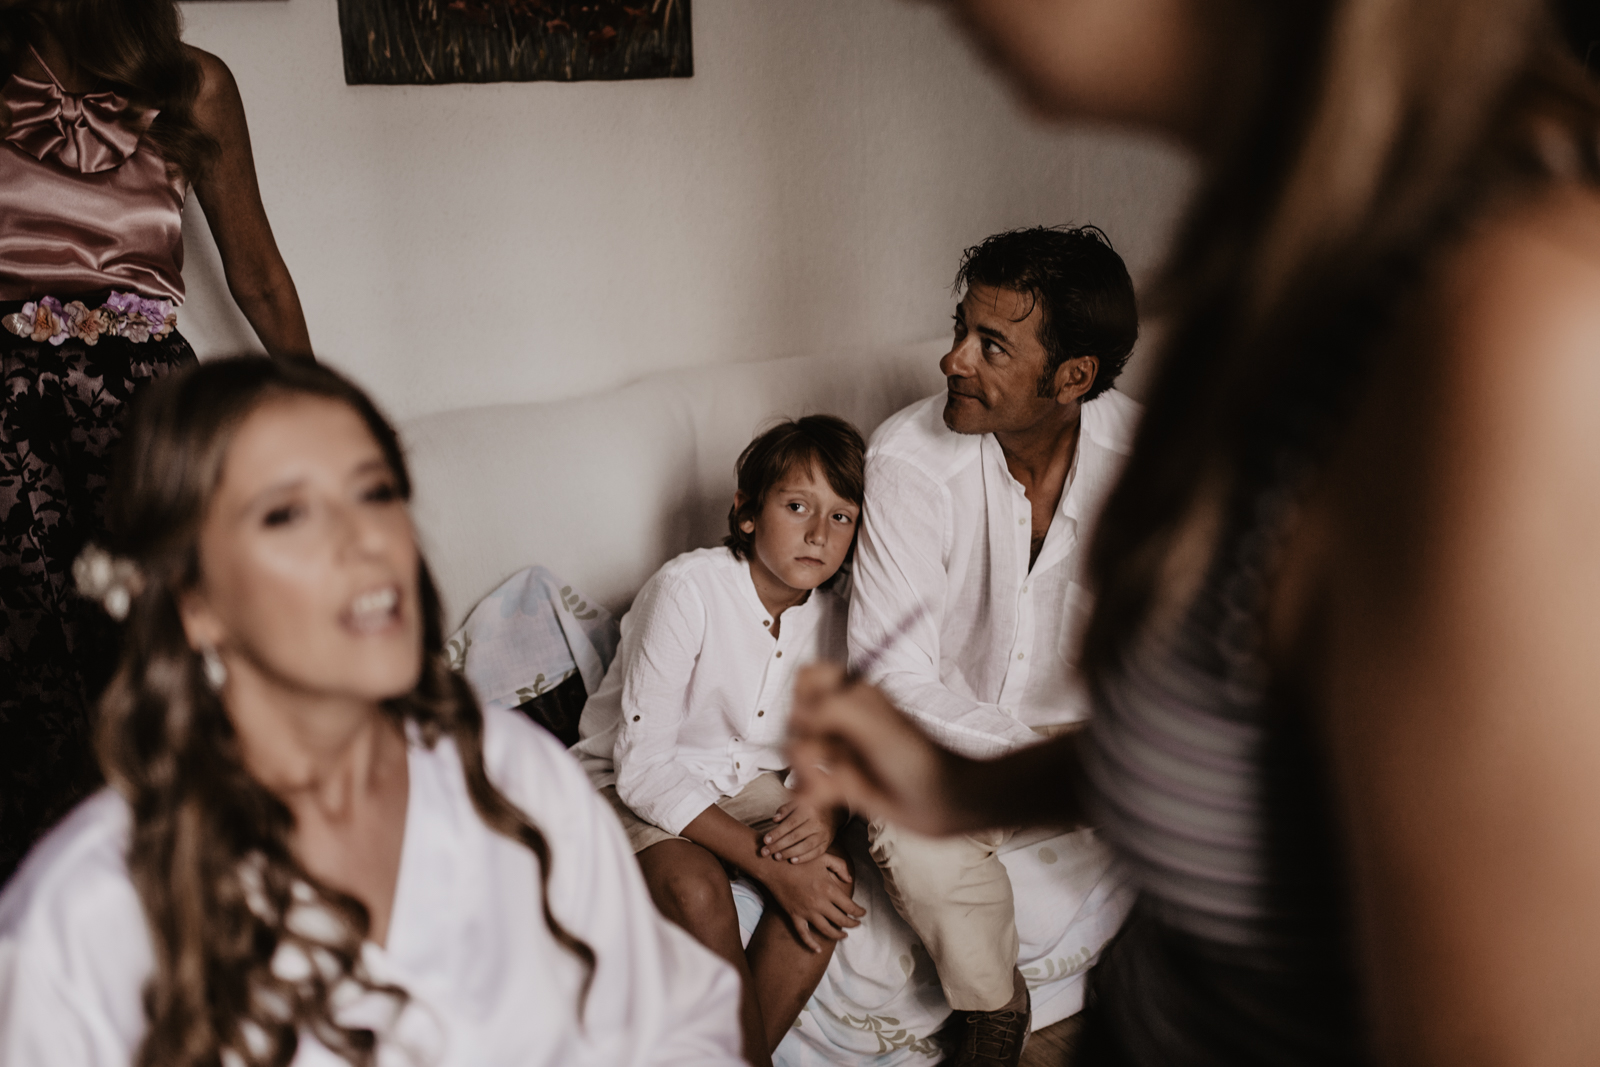 thenortherngirlphotography_photography_thenortherngirl_rebeccascabros_wedding_weddingphotography_weddingphotographer_barcelona_bodaenbarcelona_bodaenmaselmarti_bodarogeryvane-166.jpg